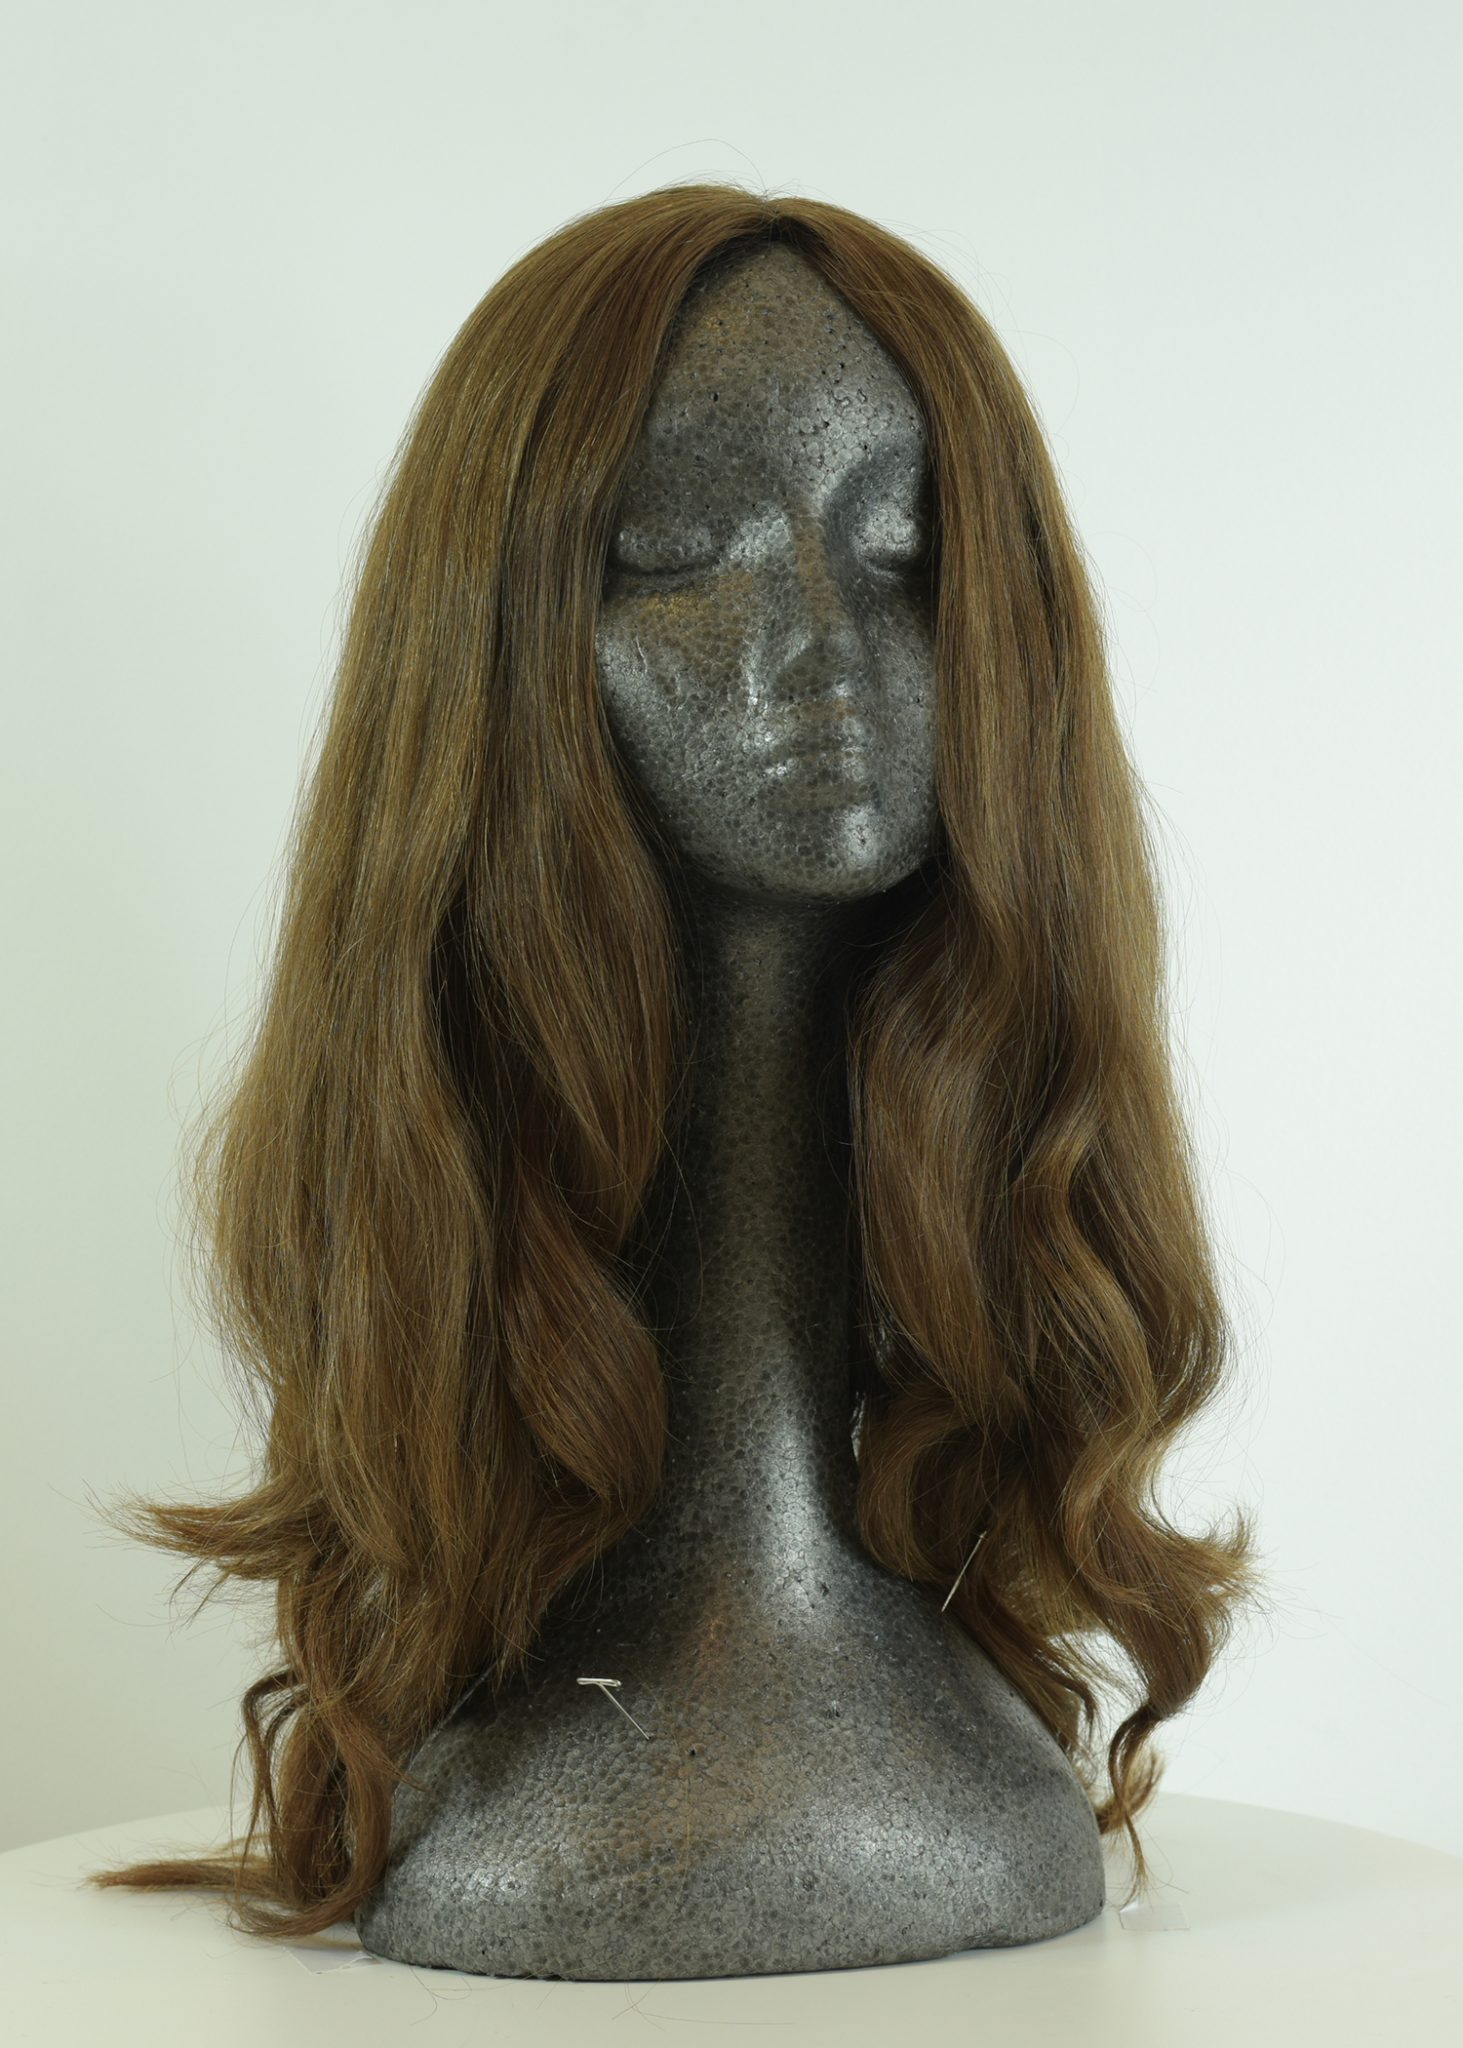 Naama group, Naama wigs, Naama hair, 360 degree band, I band, wigless wig, virgin rely hir, processed hair, custom wigs, Frum Wigs, Sheitels, kosher wigs